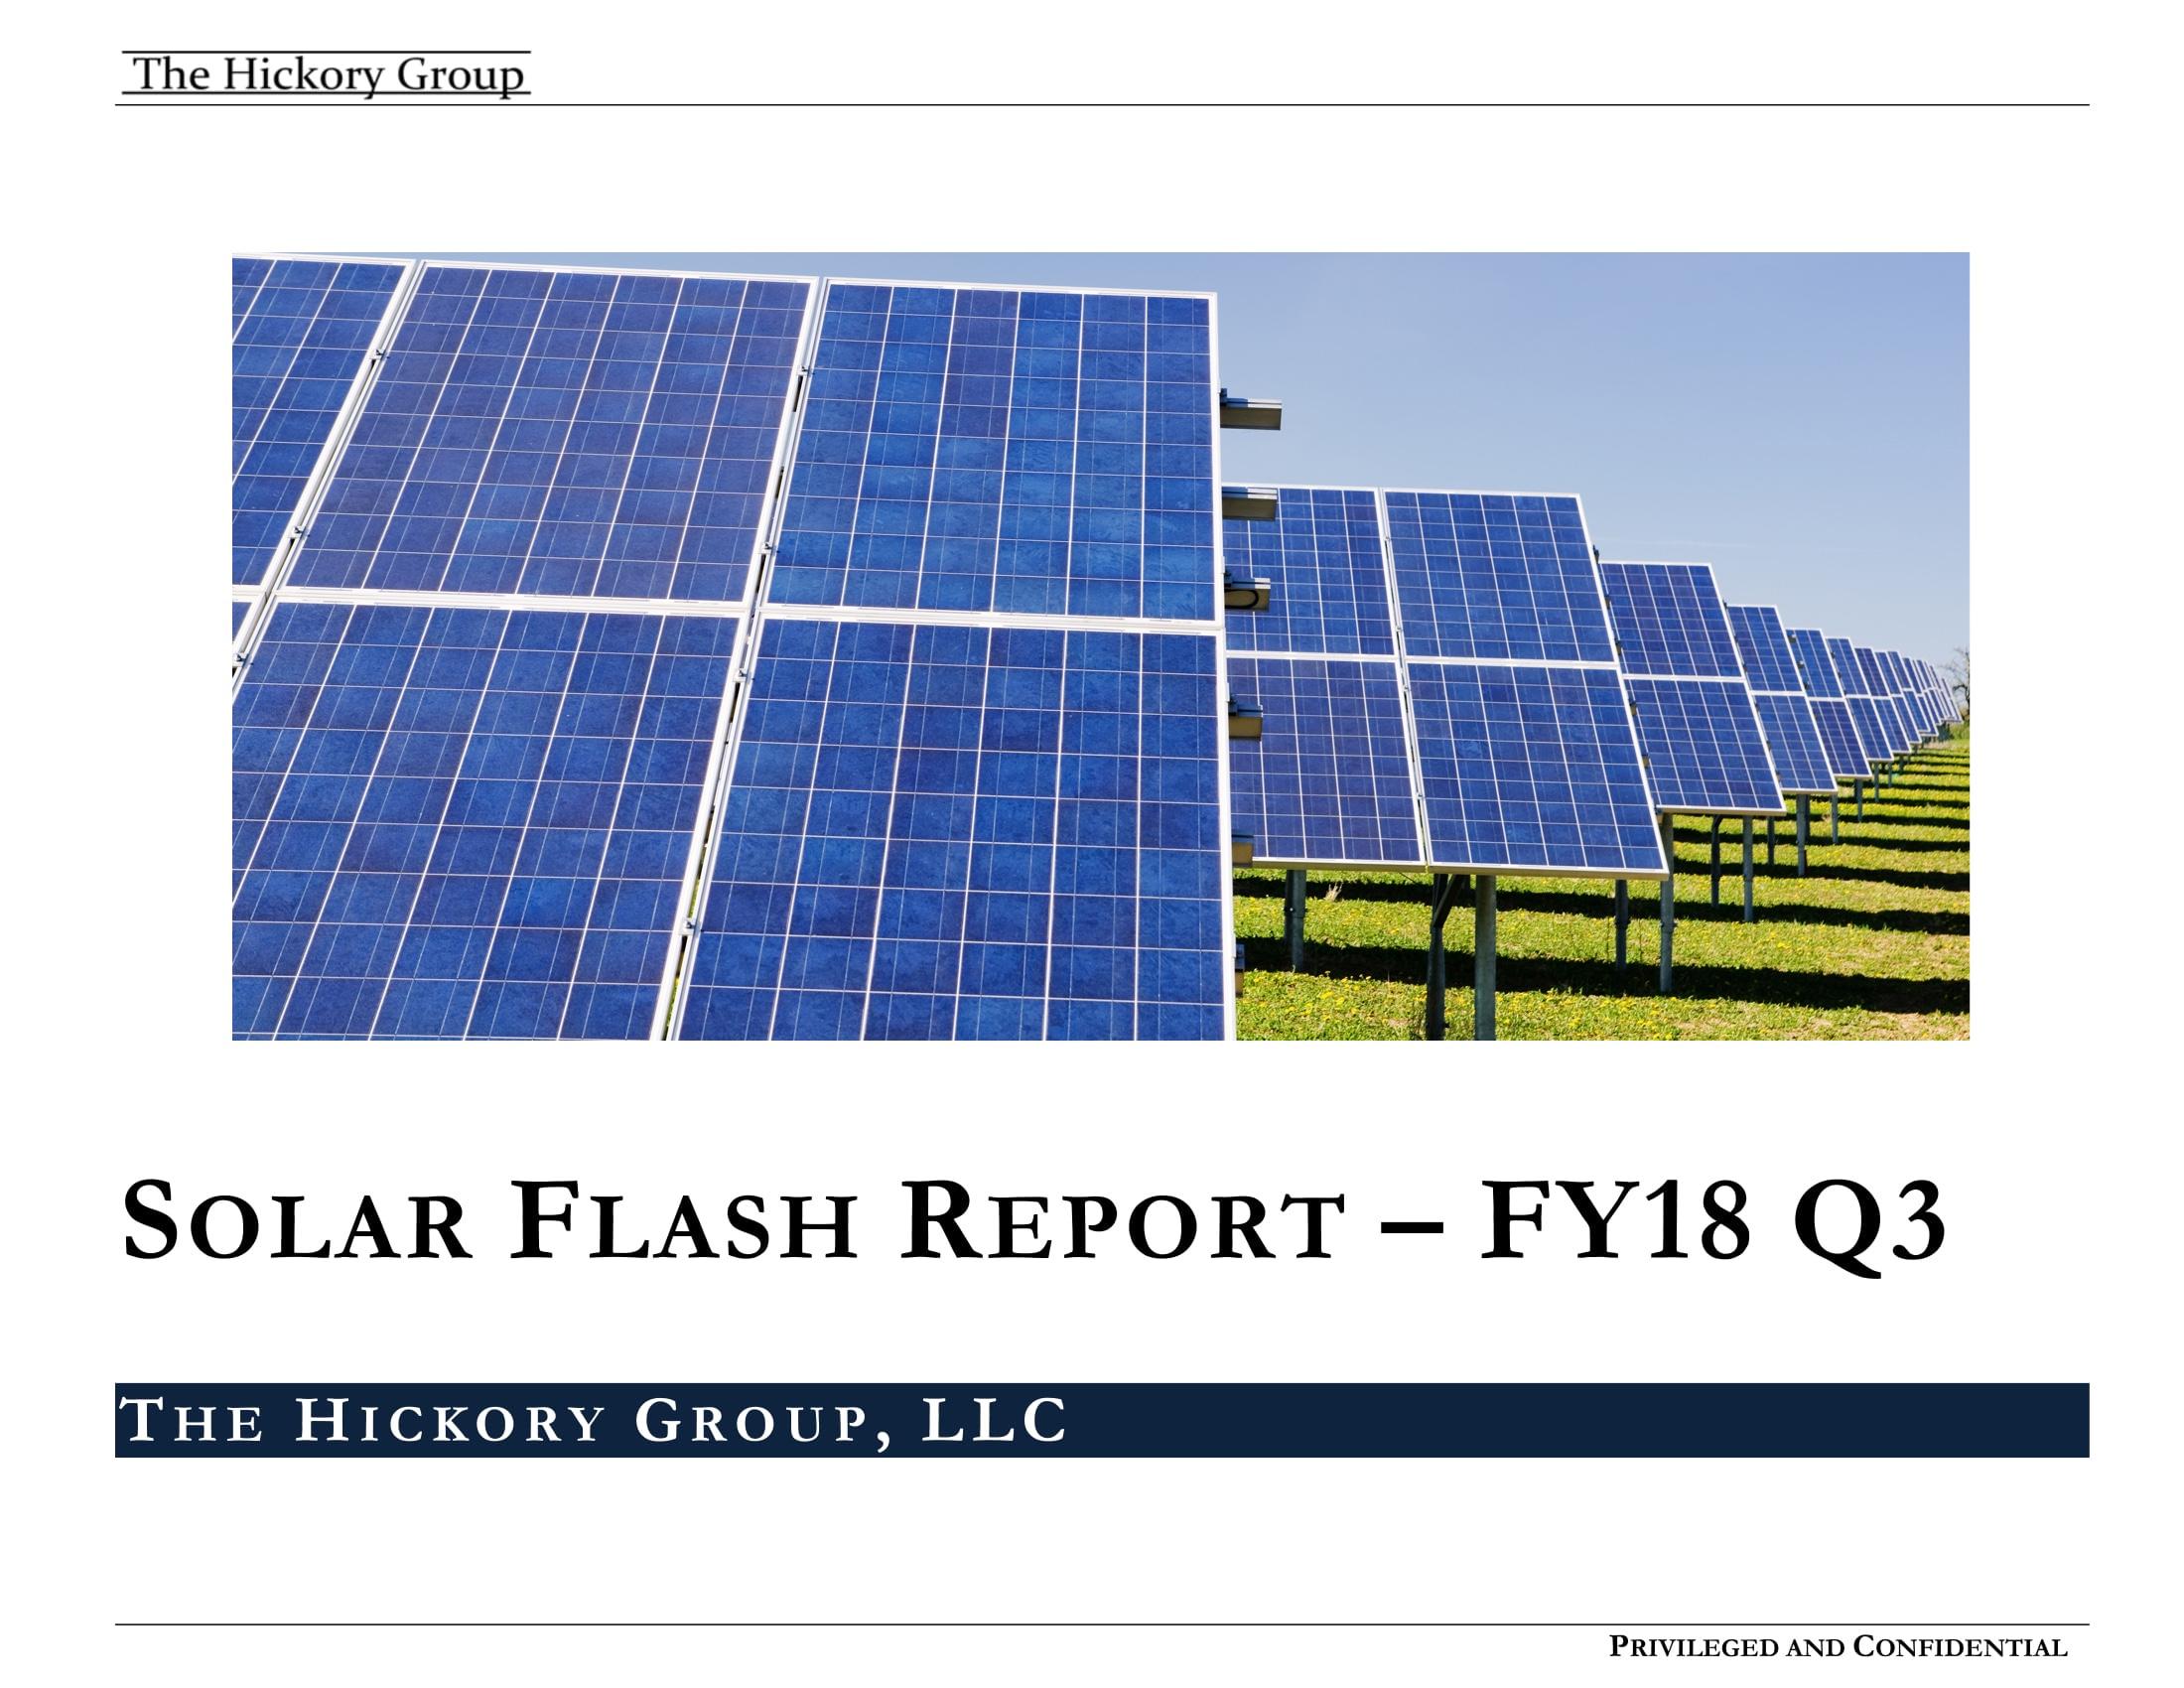 Solar Flash Report 1.jpg